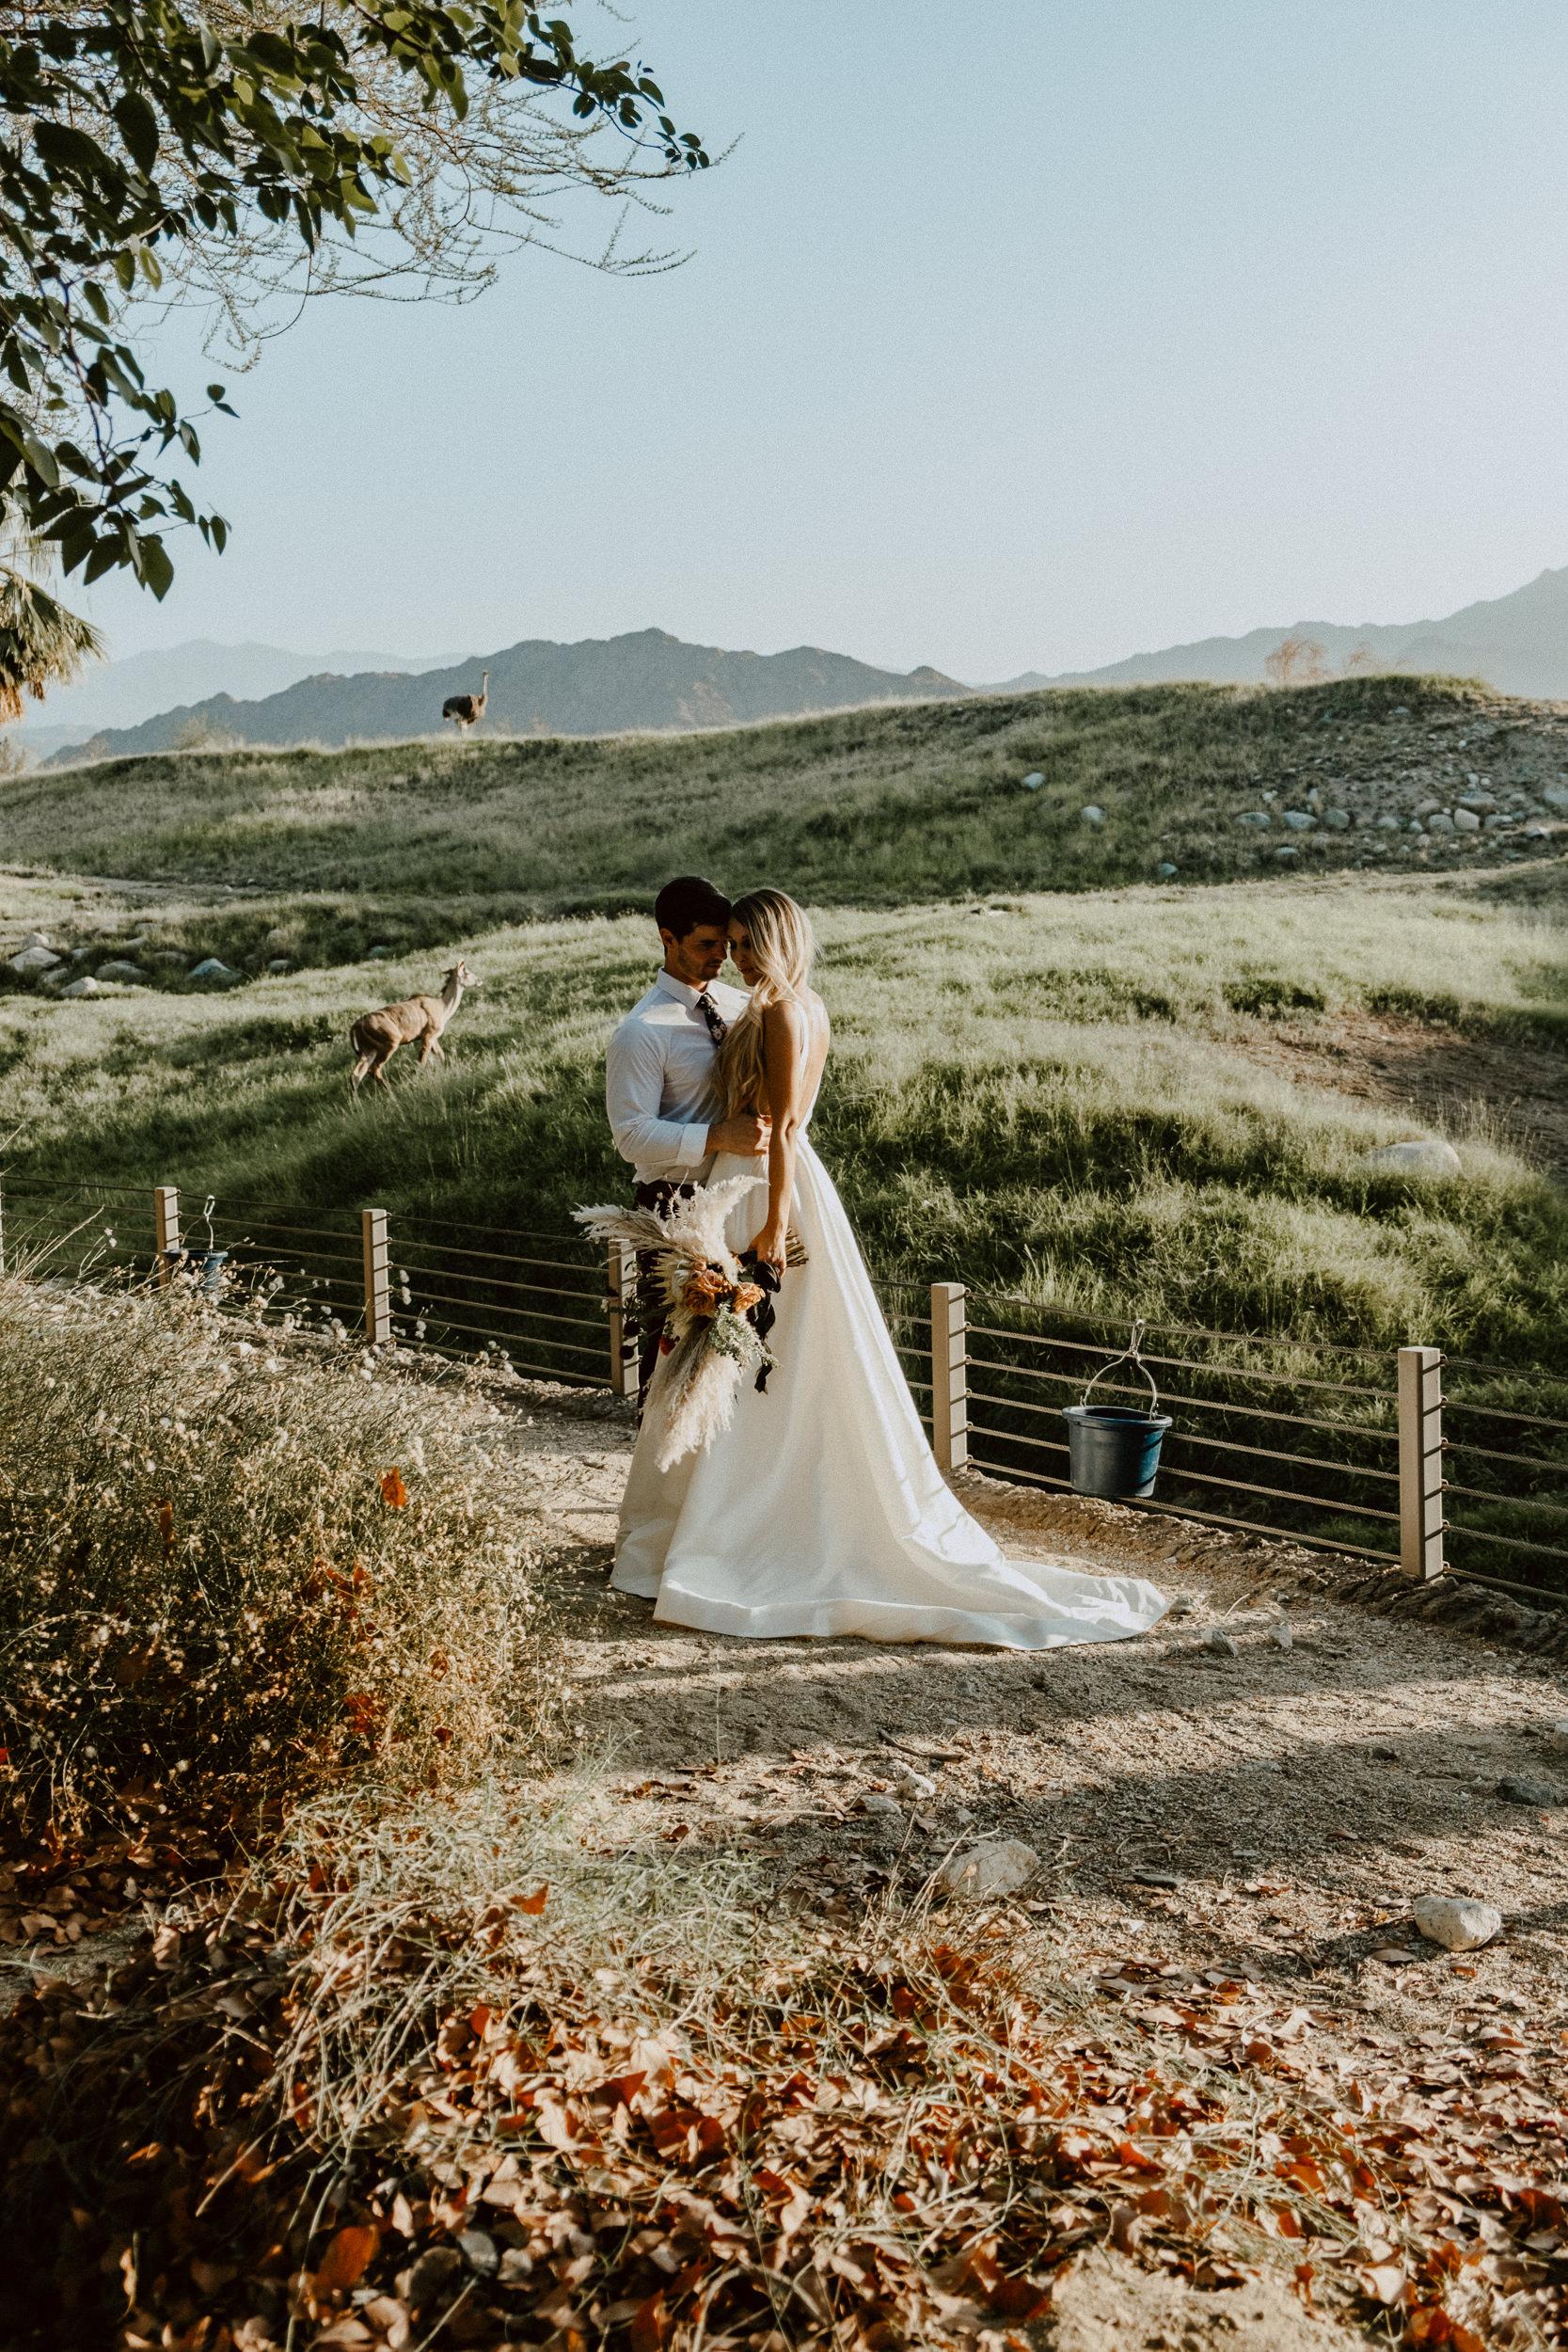 sChelsie + Chris - The Desert Shootout Wedding Romantics at The Living Desert-14.jpg